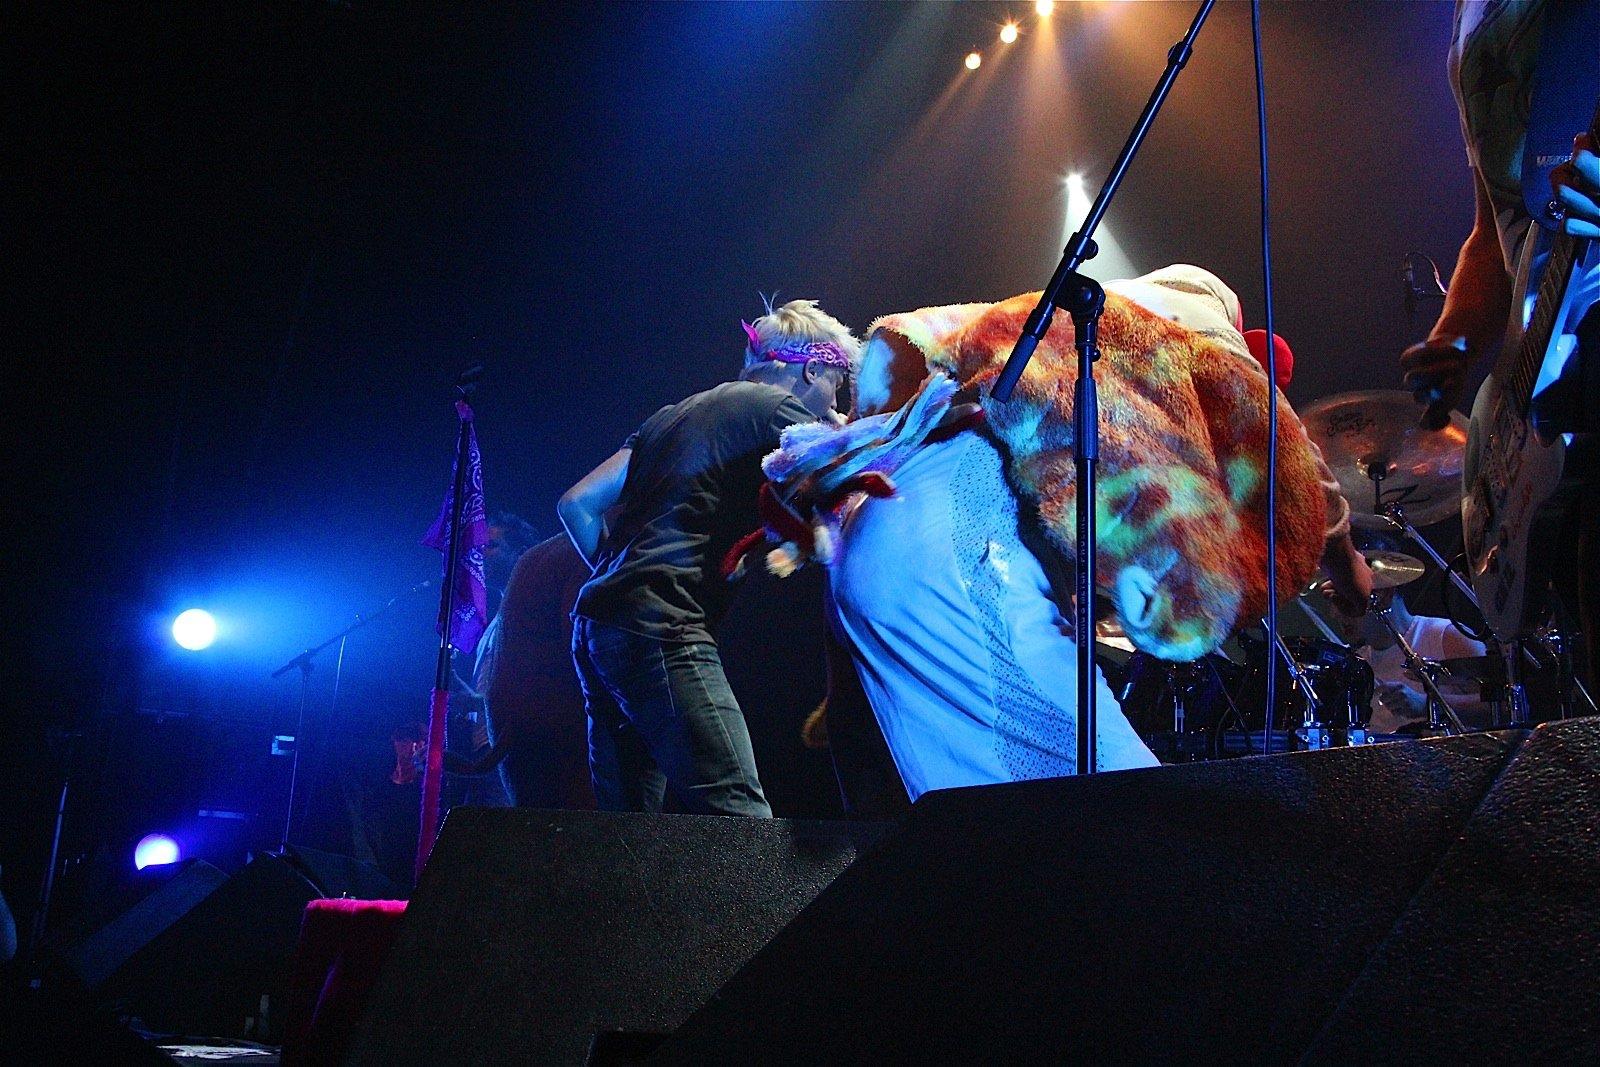 An Assfull Of Love - Rockhal Esch-sur-Alzette, 19.11.2011 (Support für J.B.O.) - Foto von Andrea Jaeckel-Dobschat - 125